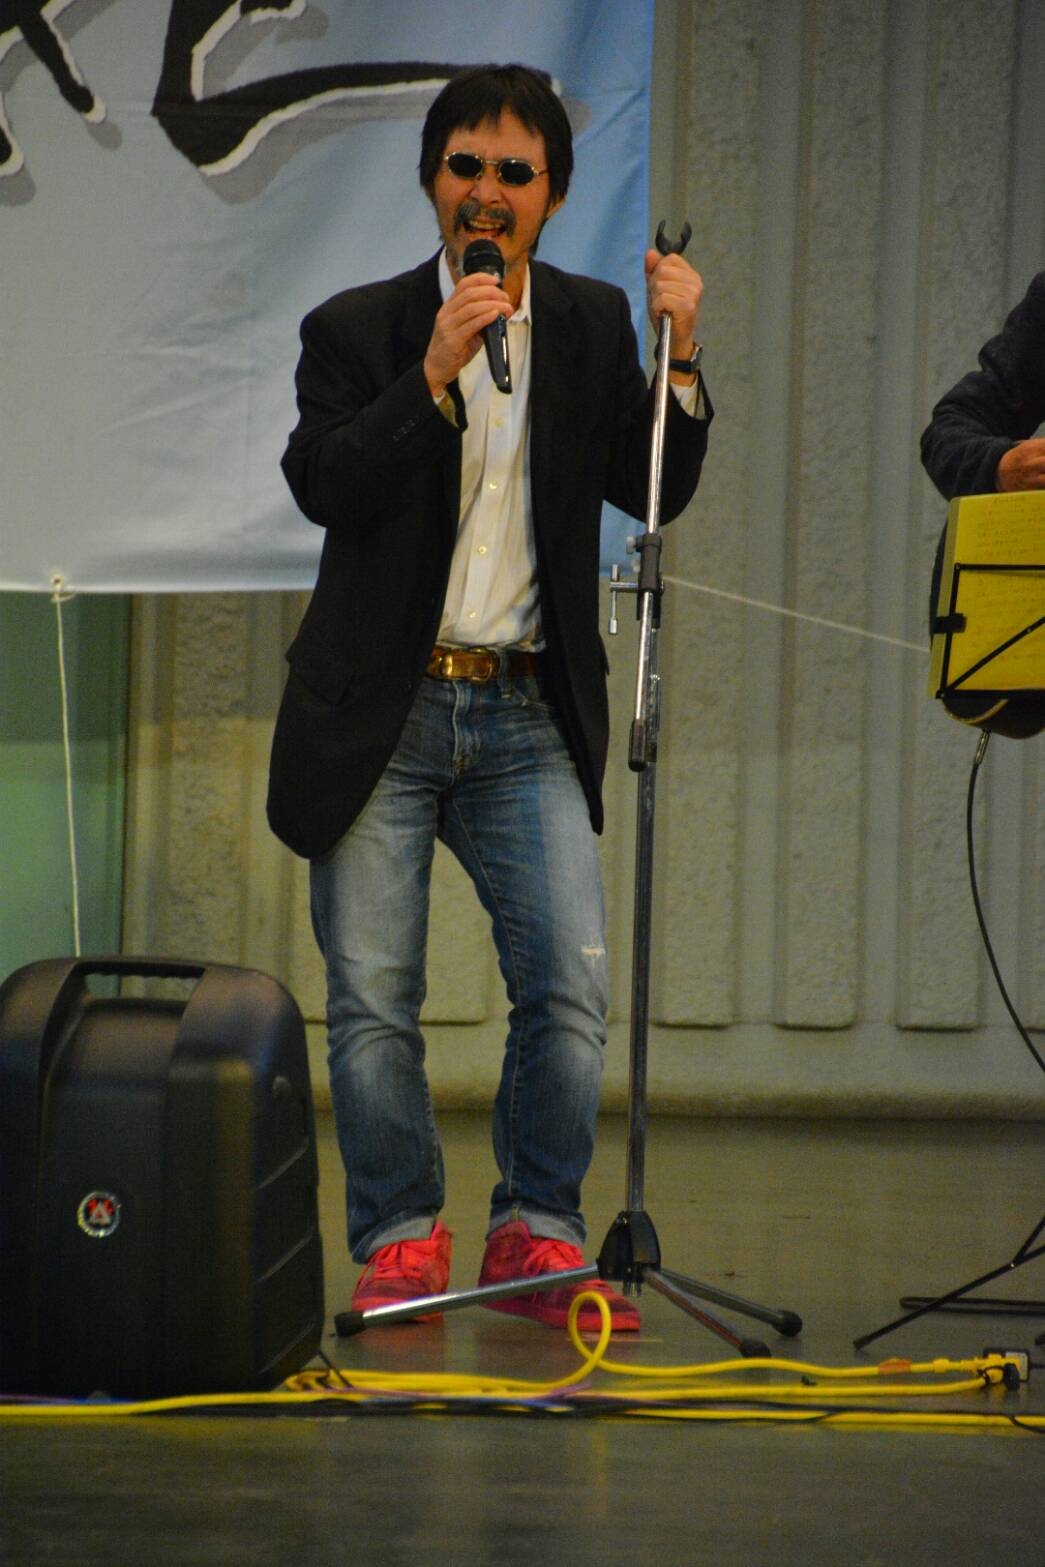 「上野音楽堂ライブ」_a0075684_1495493.jpg